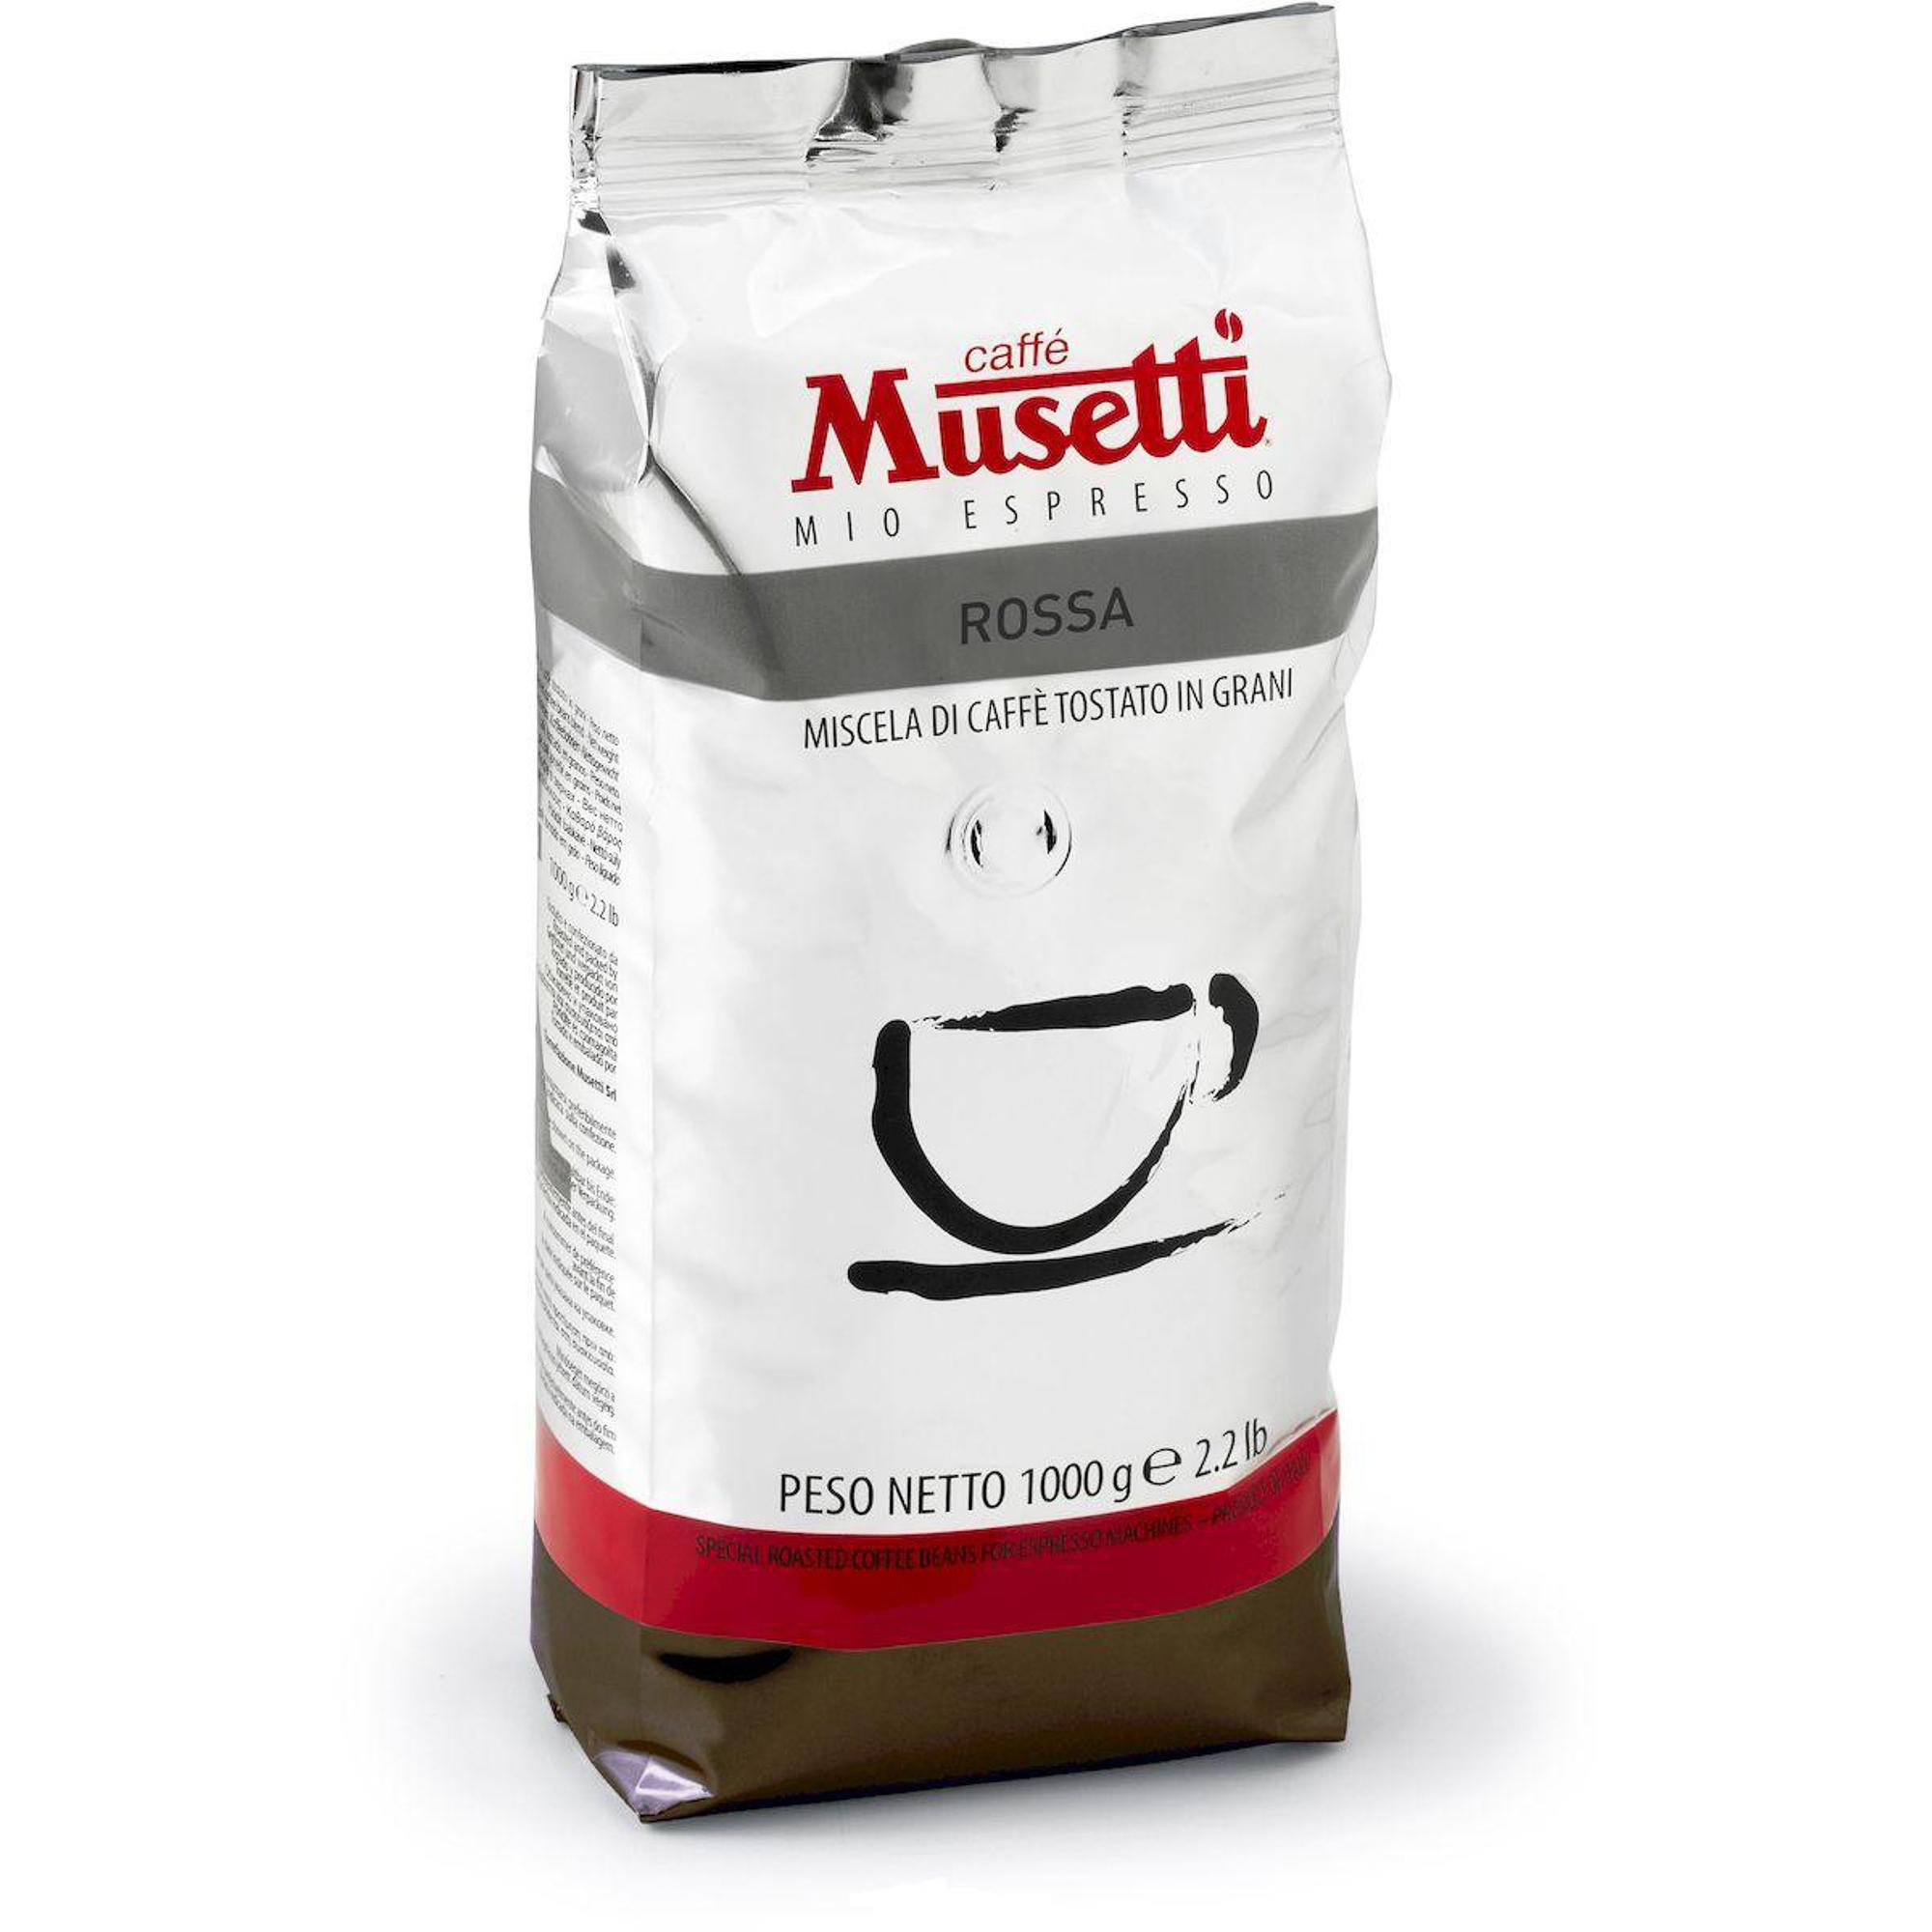 Кофе в зернах Musetti Rossa 1 кг кофе в зернах lavazza qualita rossa 1 кг